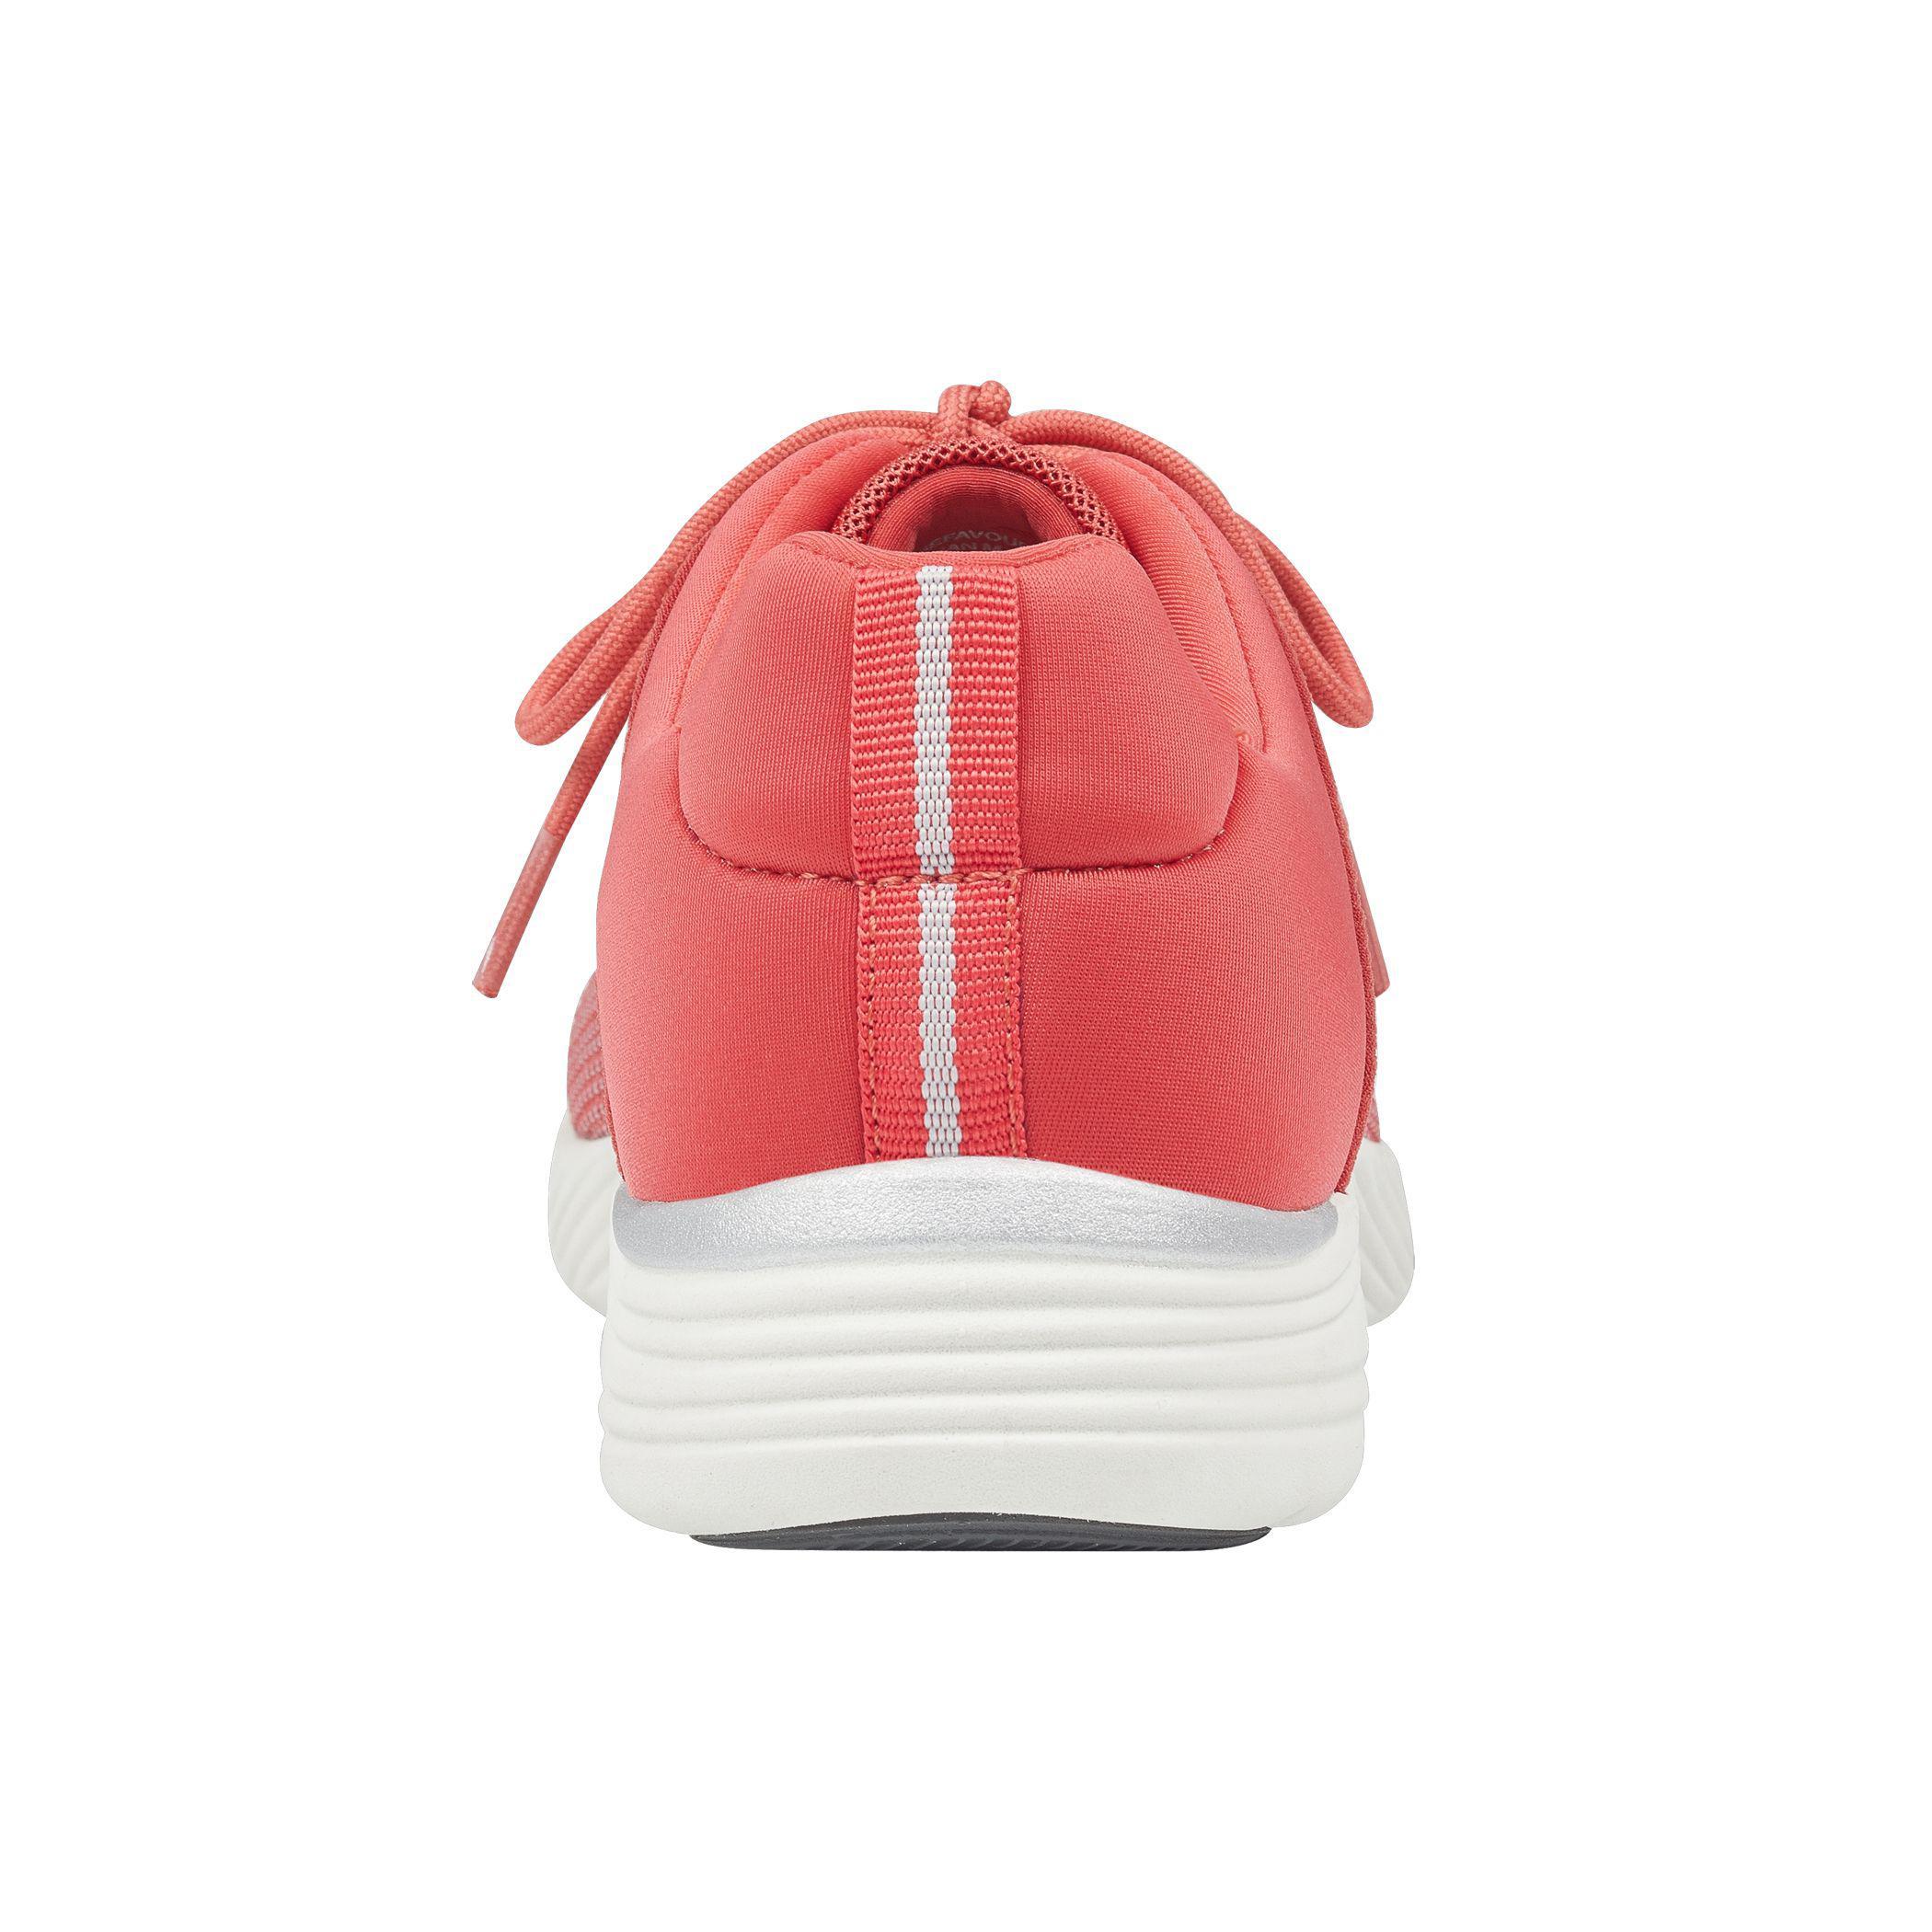 Easy-Spirit-Favour-Women-039-s-Comfort-Walking-Lace-Up-Shoes thumbnail 5